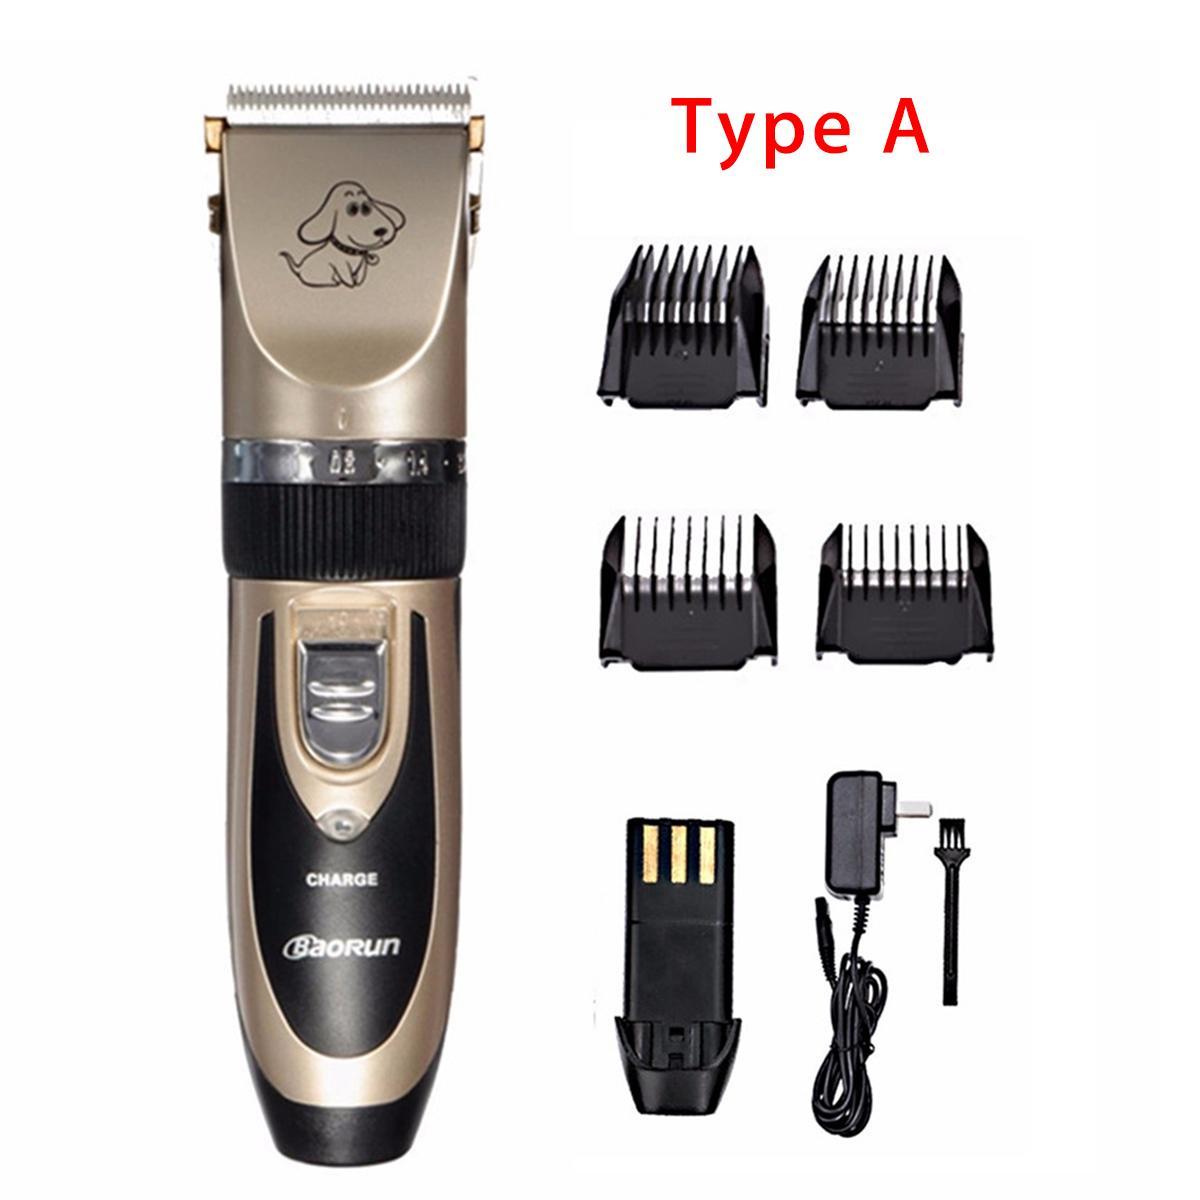 Rechargeable Baorun Electrical Pet Hair Trimmer 21 » Pets Impress